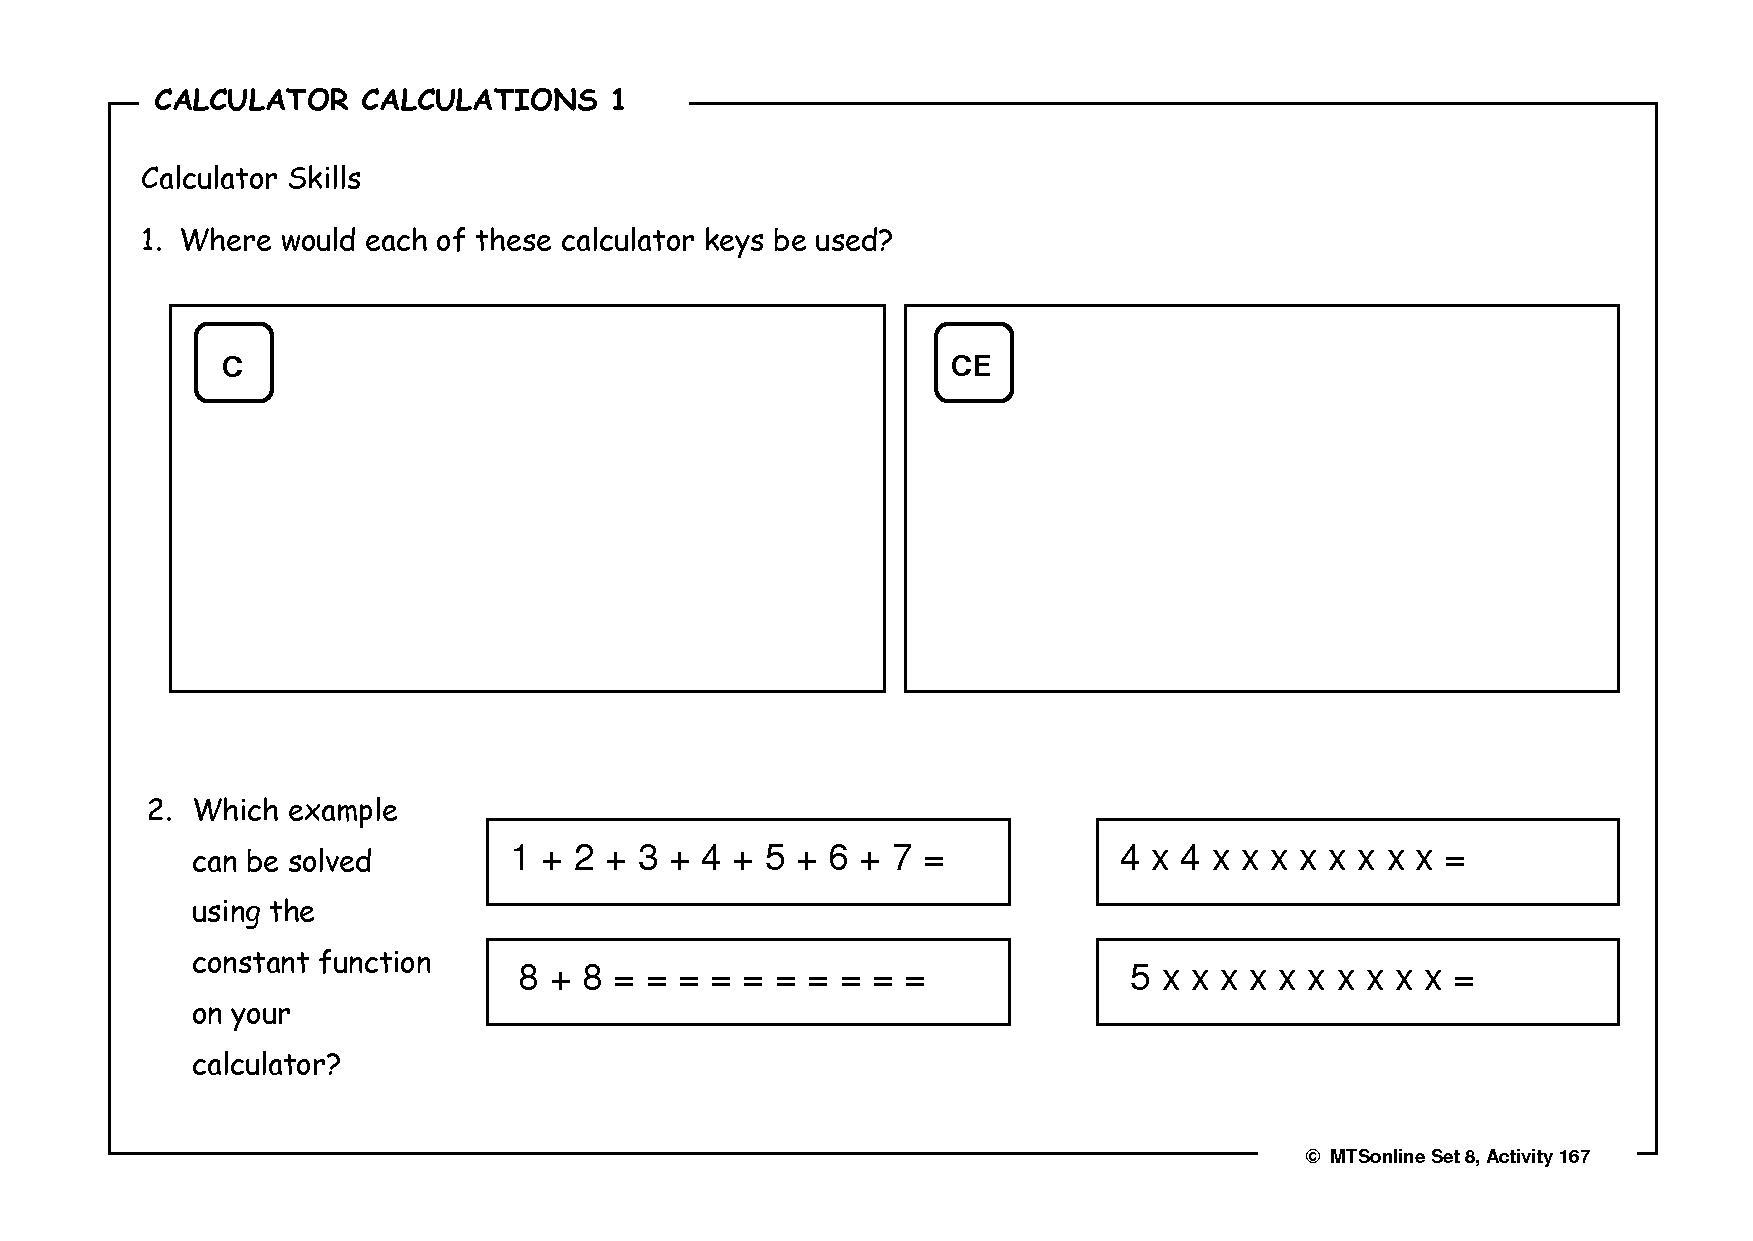 167calculator_calculations_1.gb0001